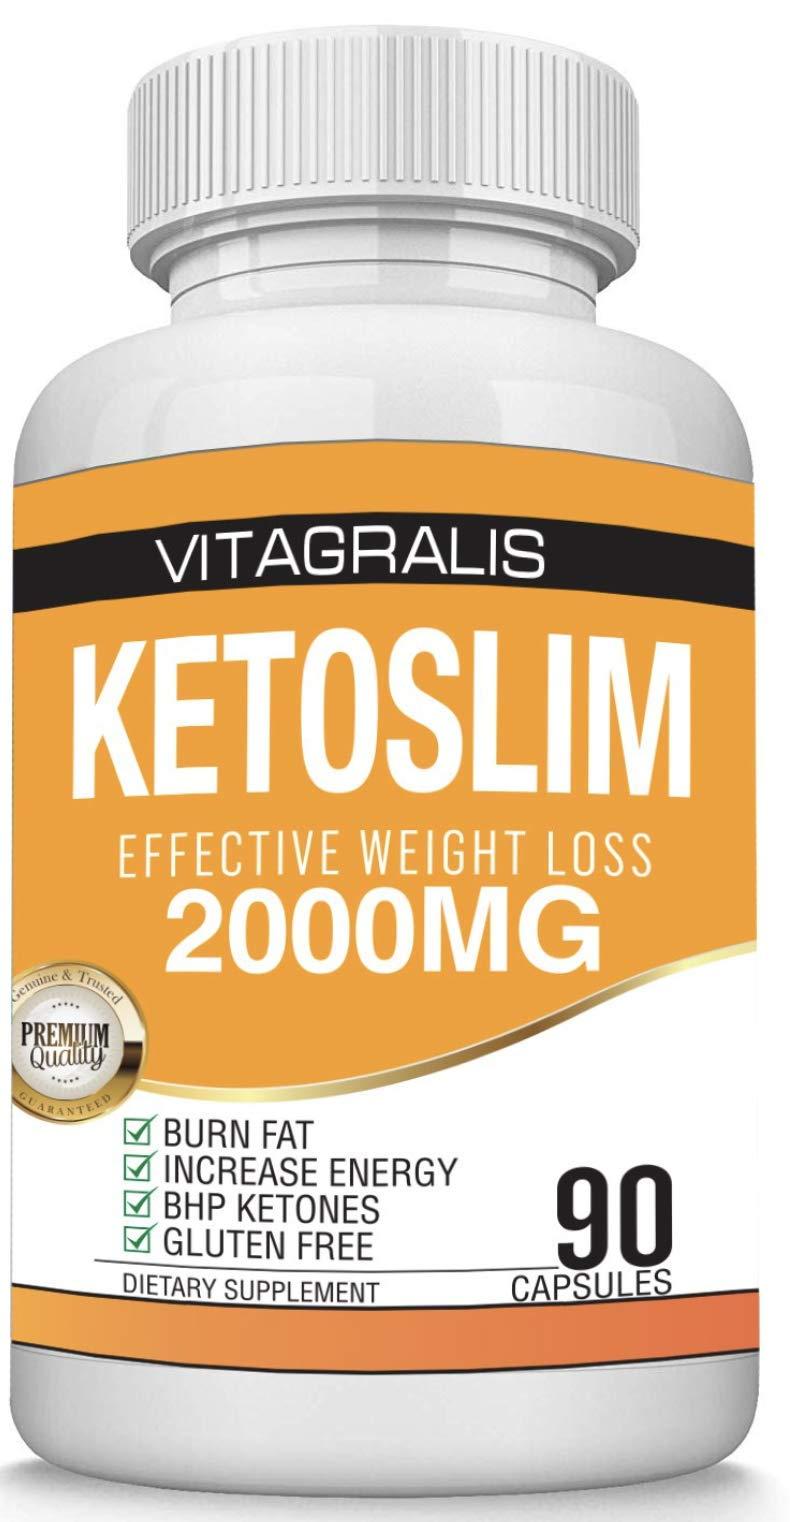 Keto Pills - Advanced Ketosis Weight Loss - Premium Keto Diet Pills - Burn Fat for Energy not Carbs